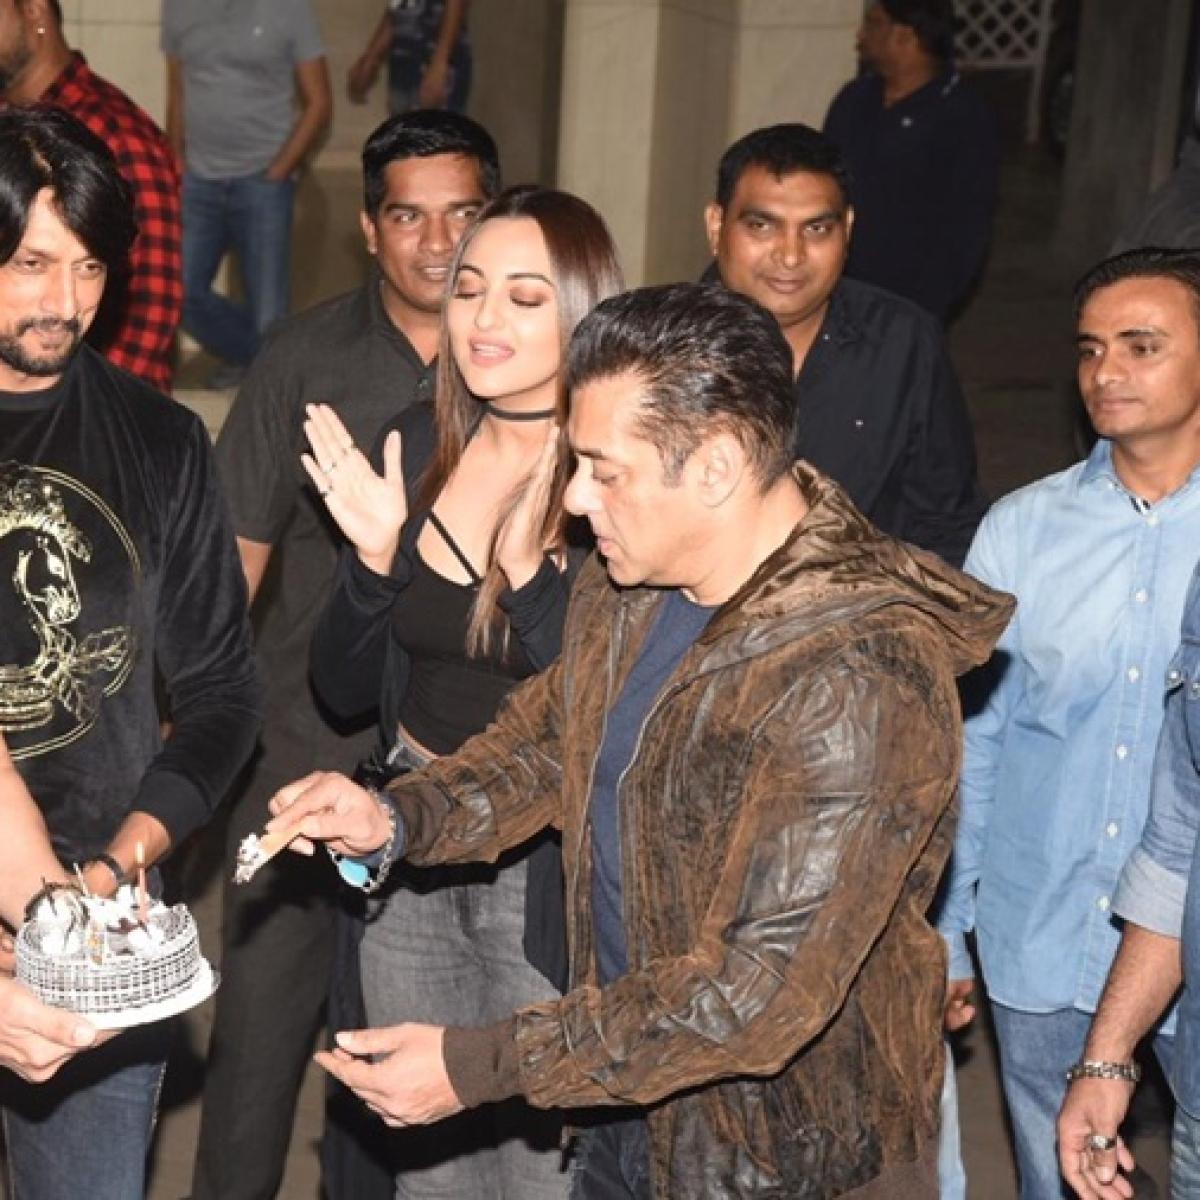 Watch video: Salman Khan turns 54 today, celebrates birthday with 'Dabangg 3' co-stars